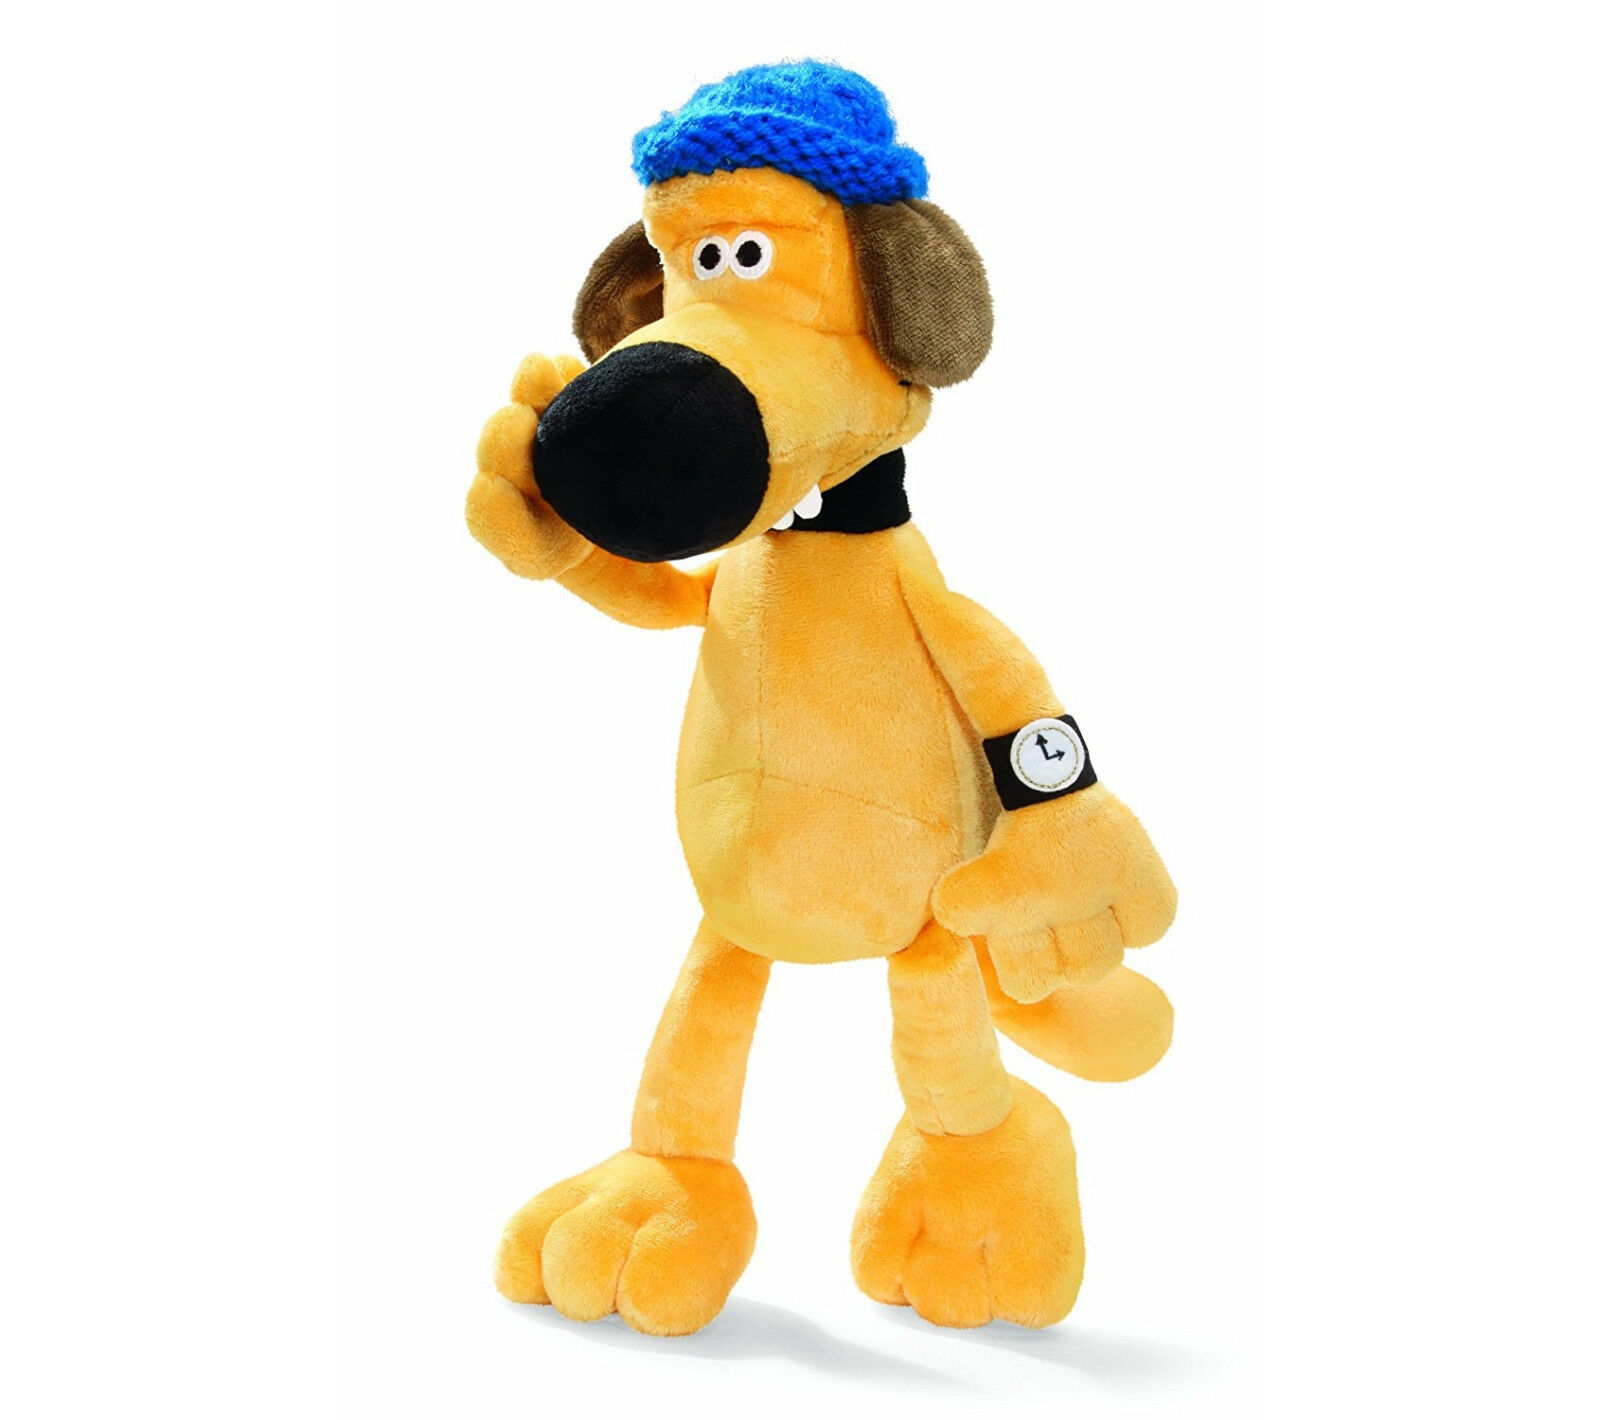 Stuffed toy Shaun the Sheep